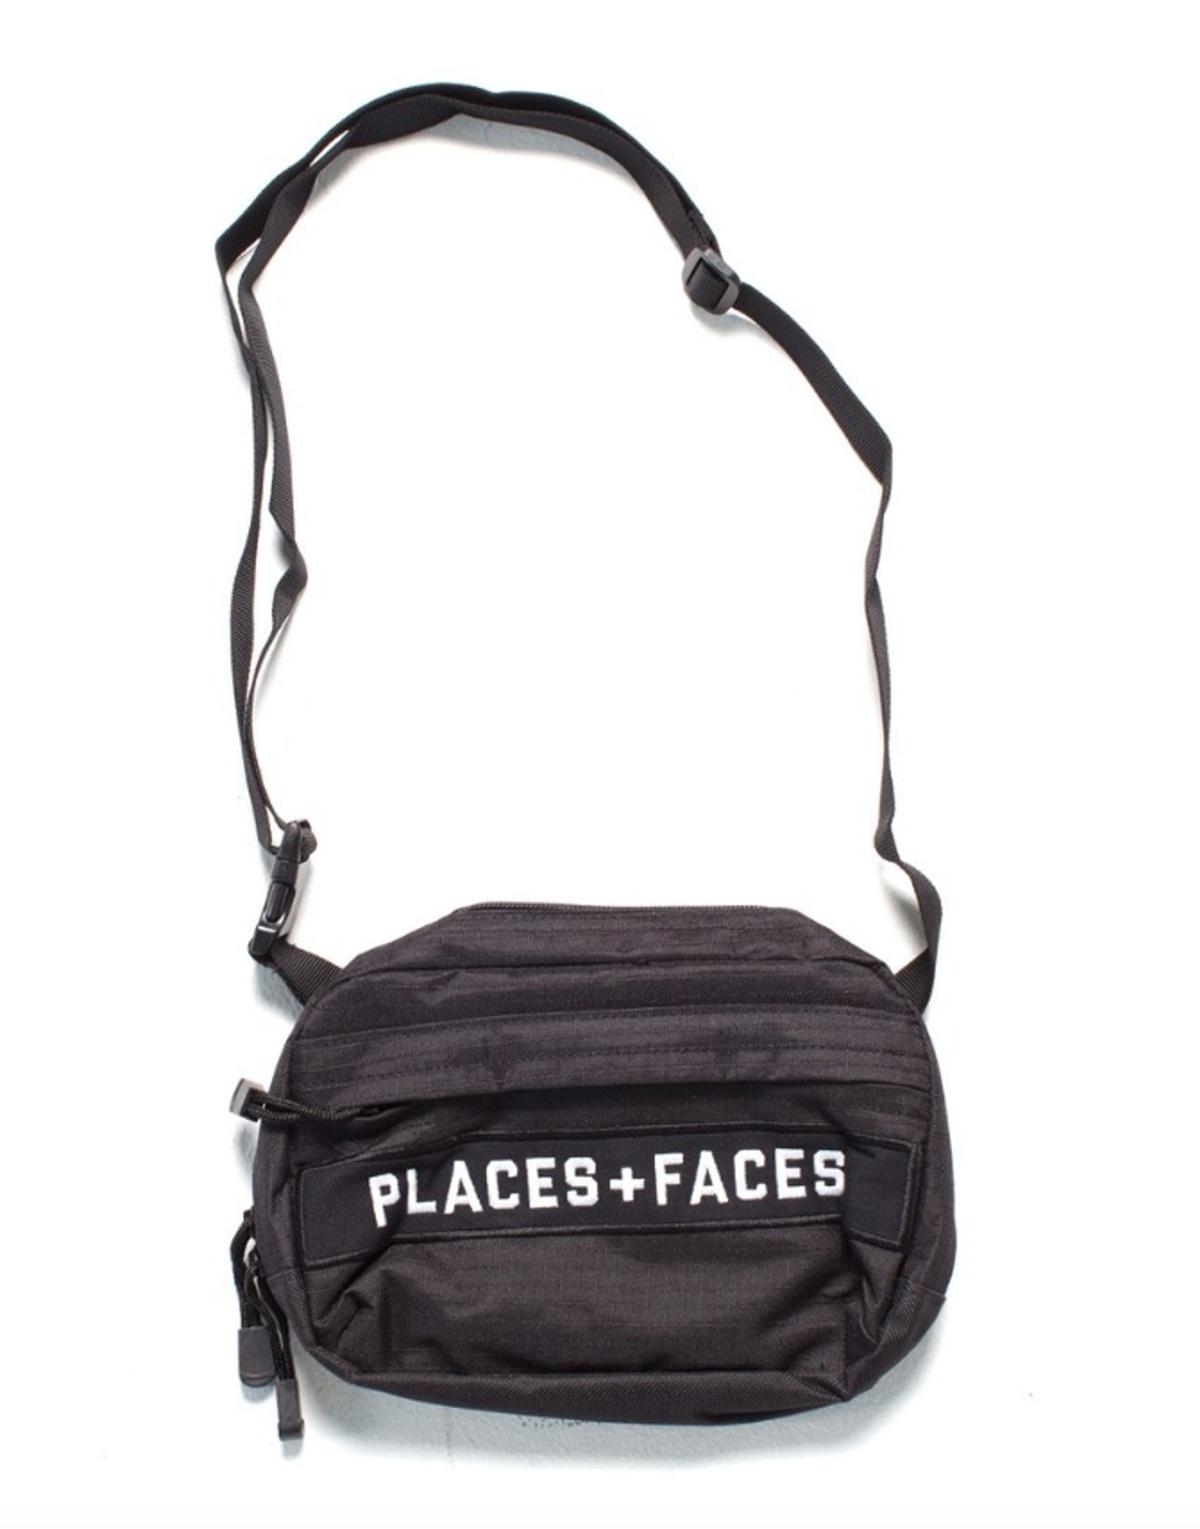 Places Faces Places Faces Pouch Shoulder Bag Size One Size Bags Amp Luggage For Sale Grailed